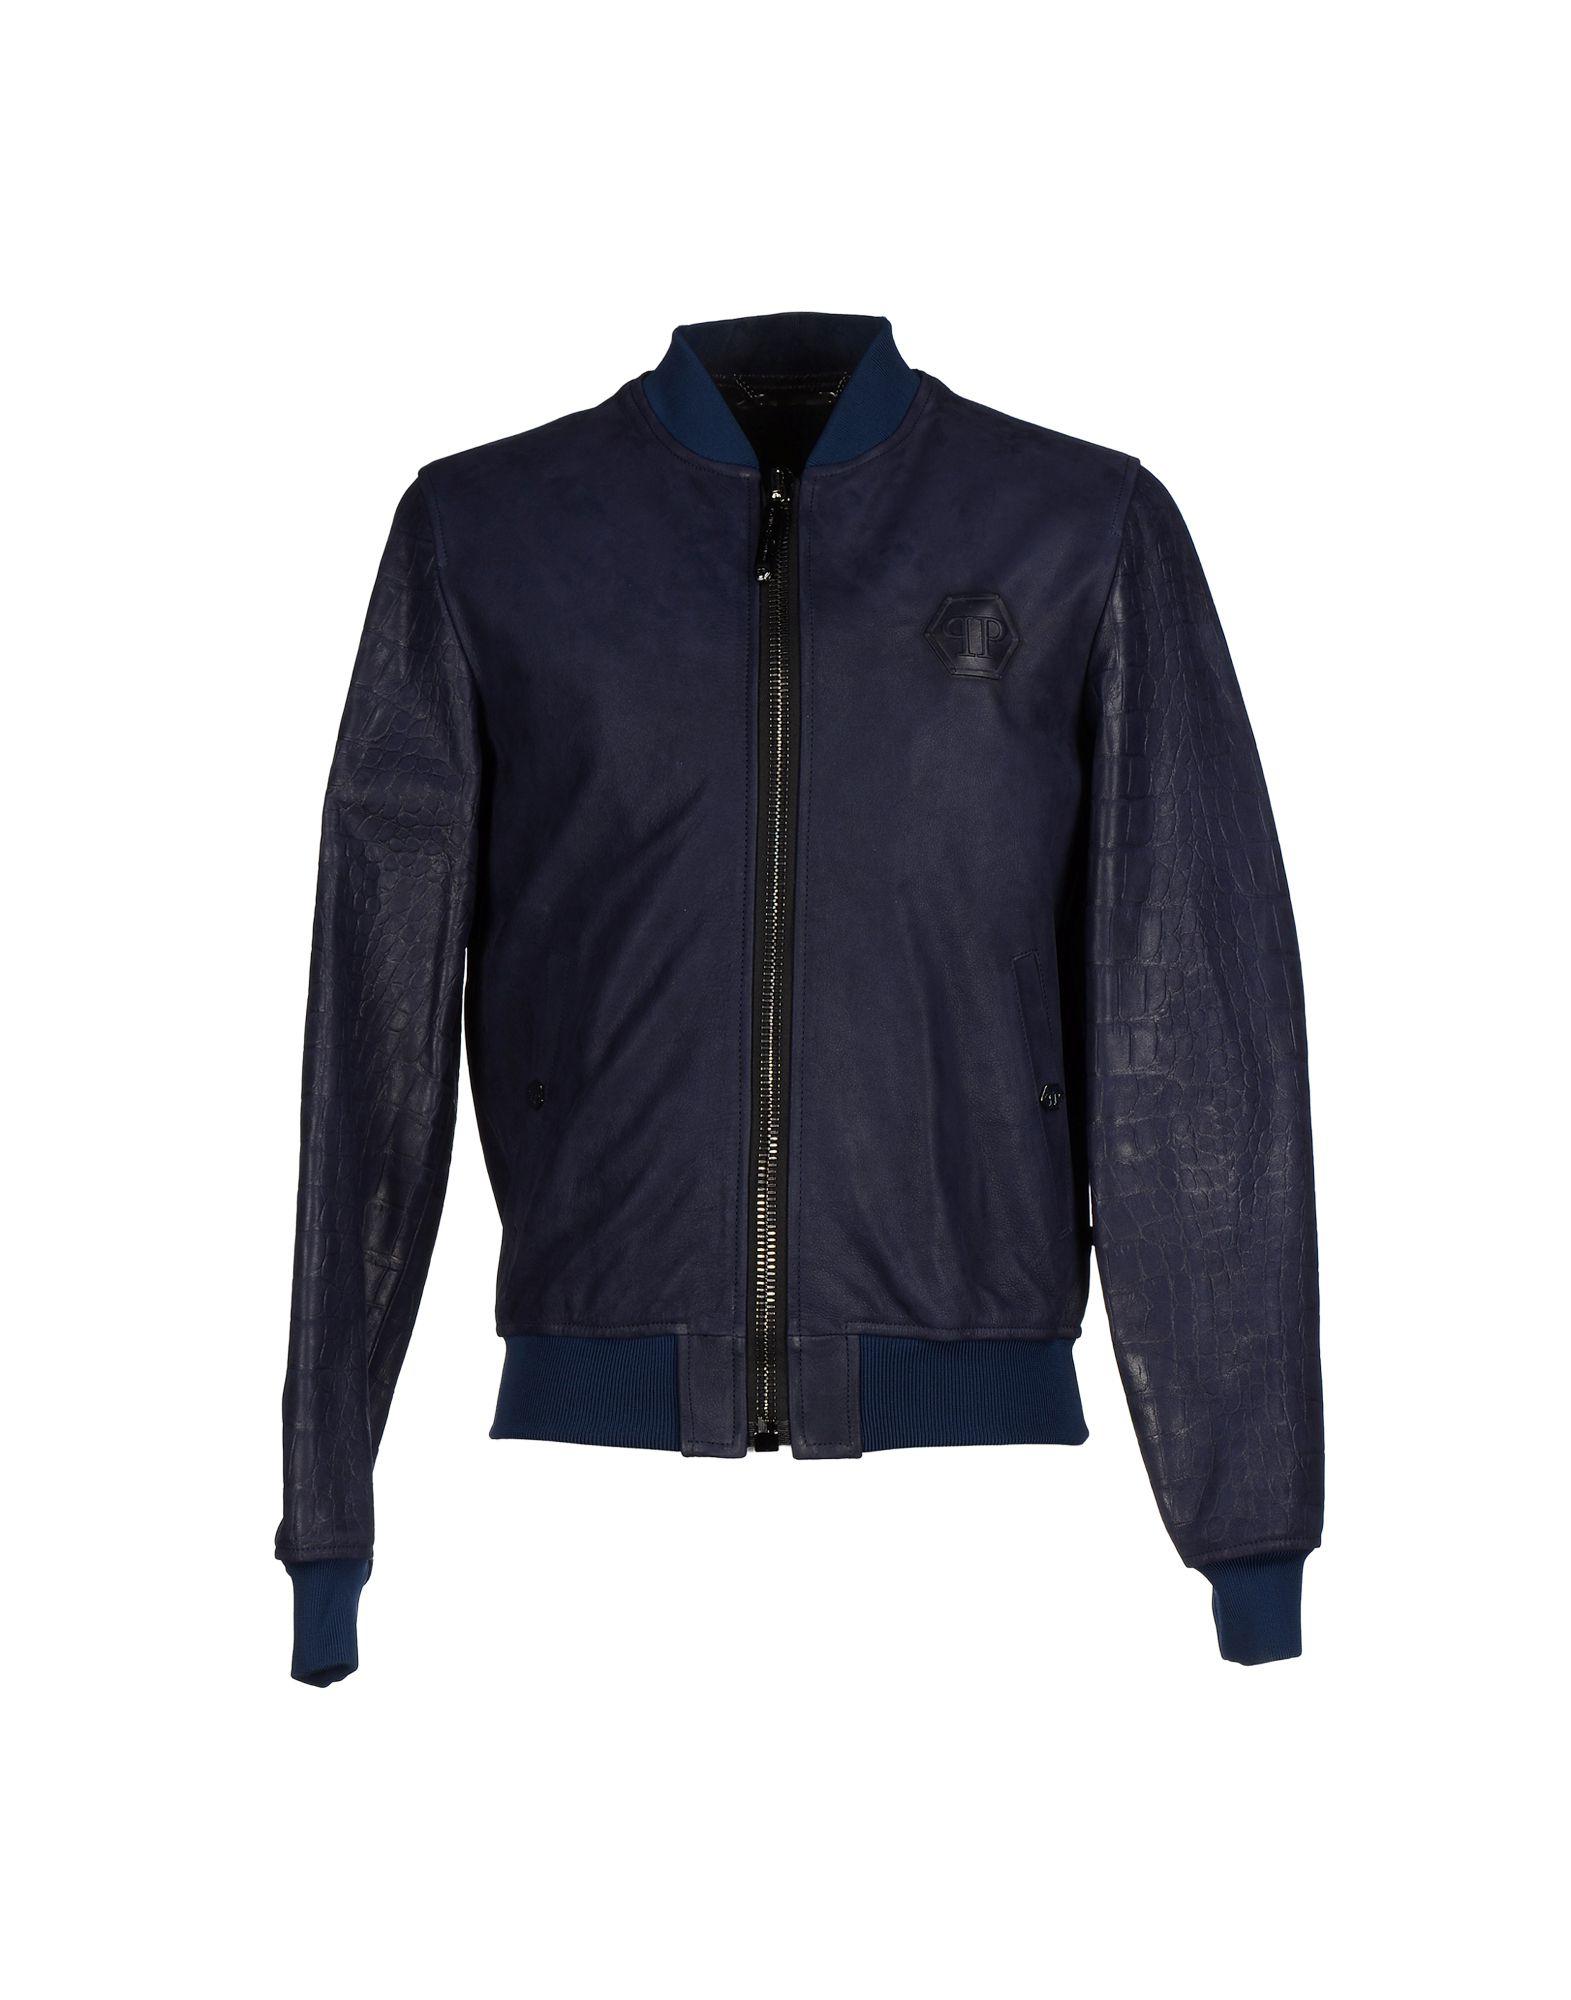 philipp plein jacket in blue for men lyst. Black Bedroom Furniture Sets. Home Design Ideas